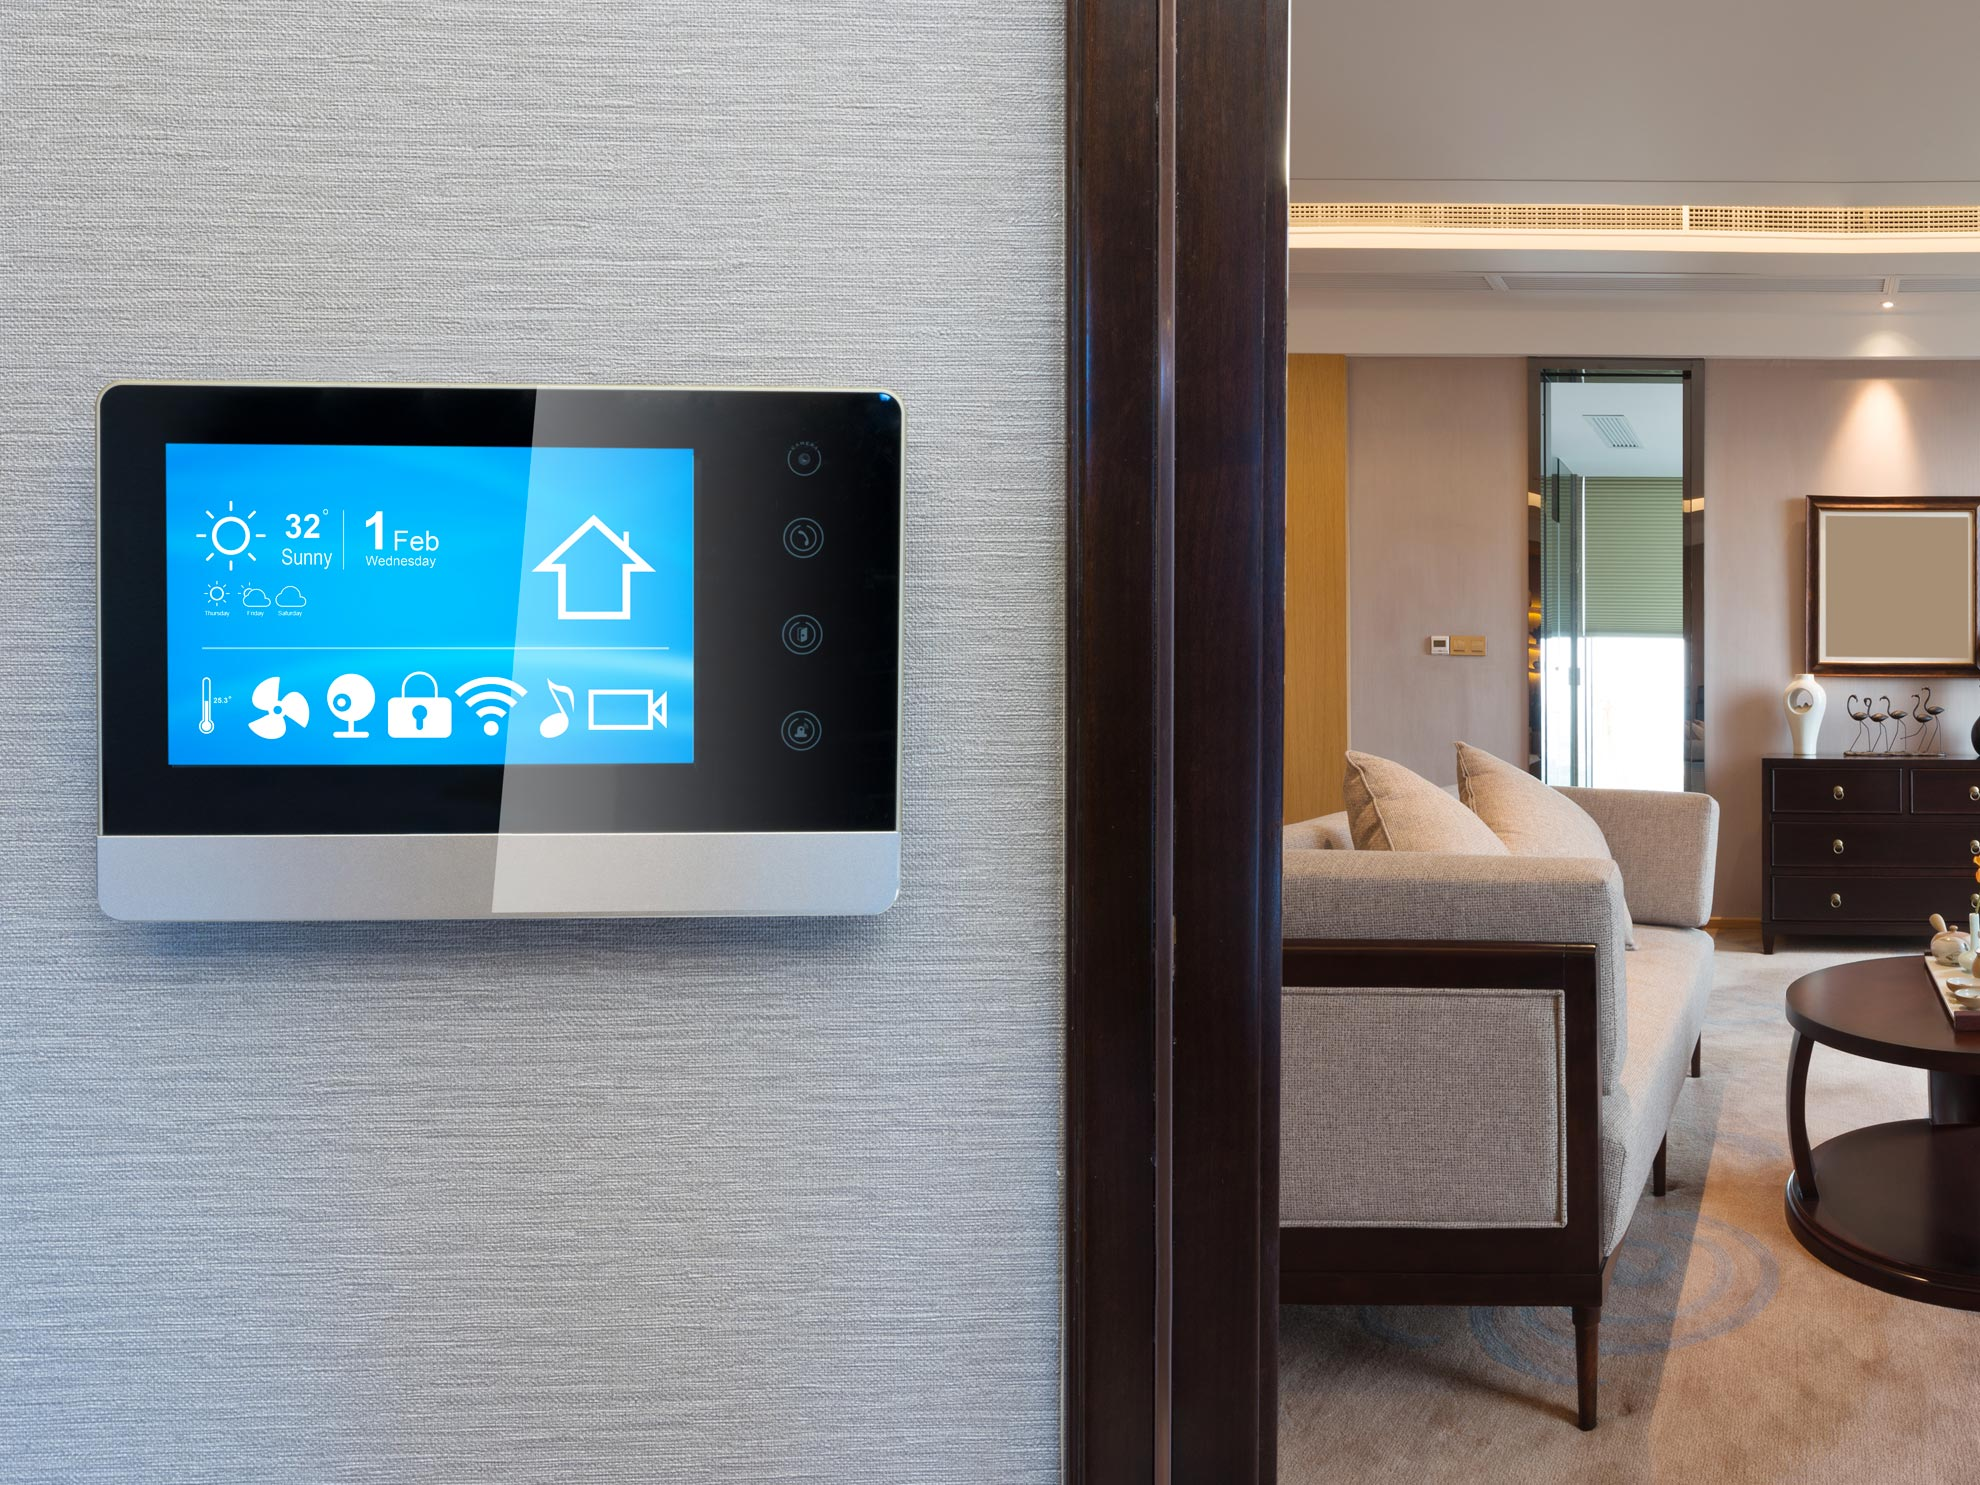 albergo-innovativo-digitale